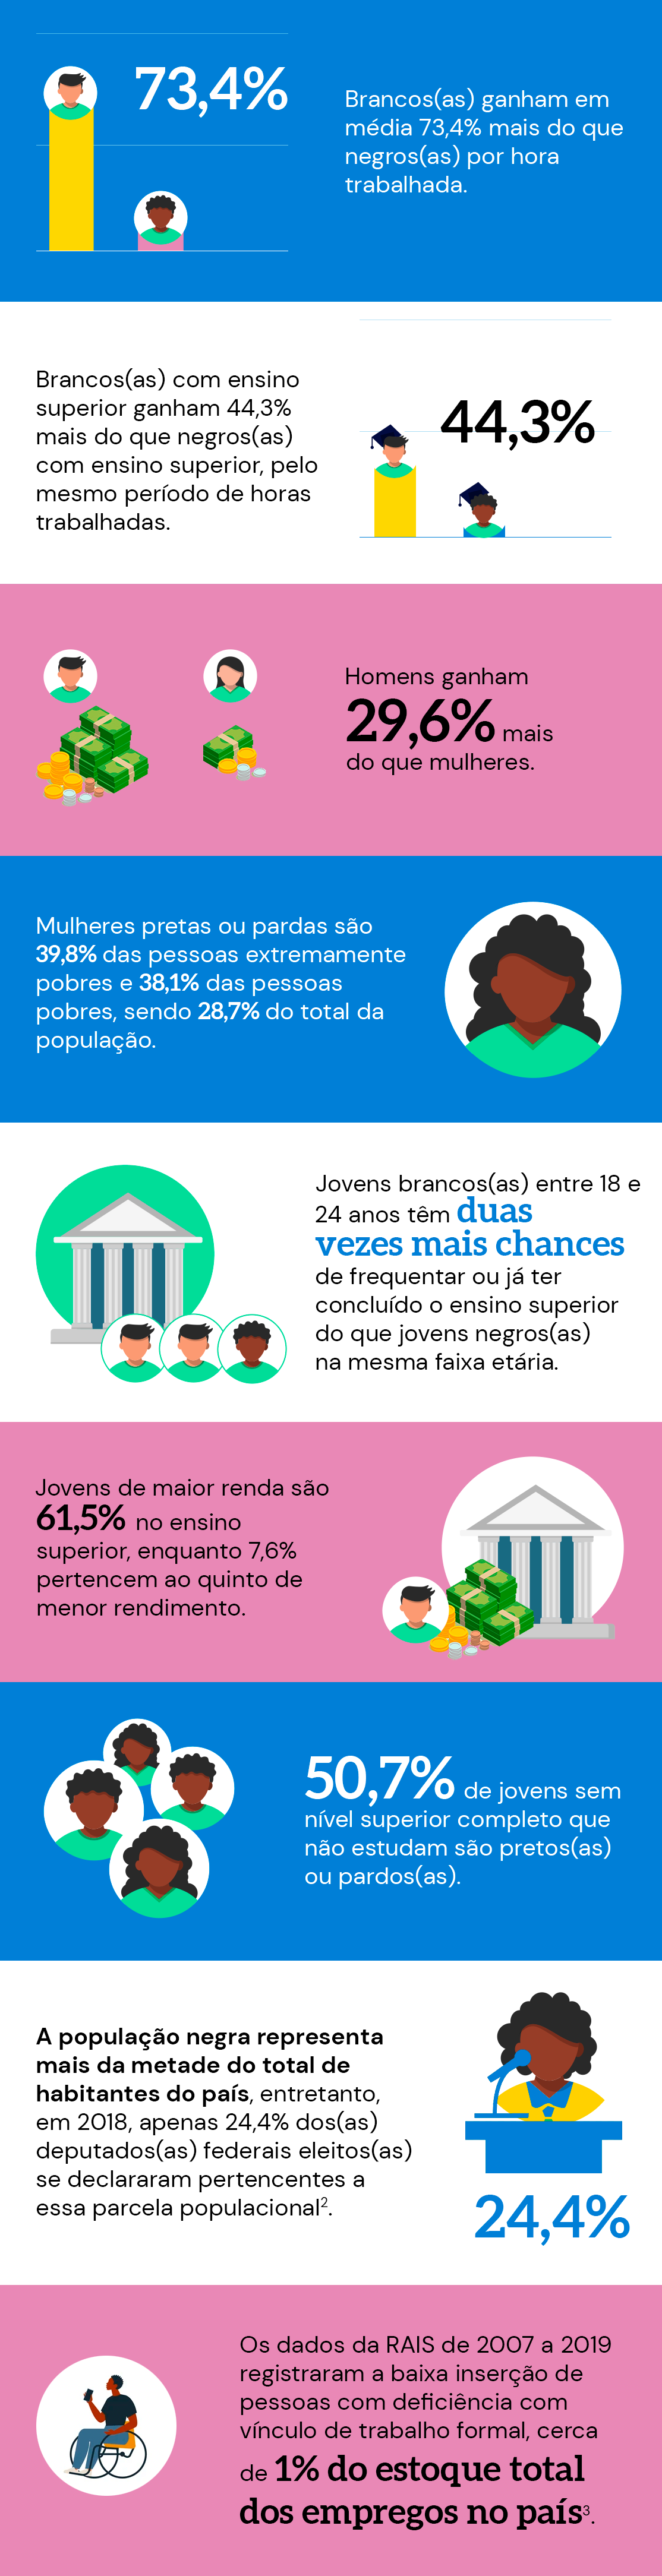 Infográfico apresentando dados sobre desigualdades educacionais